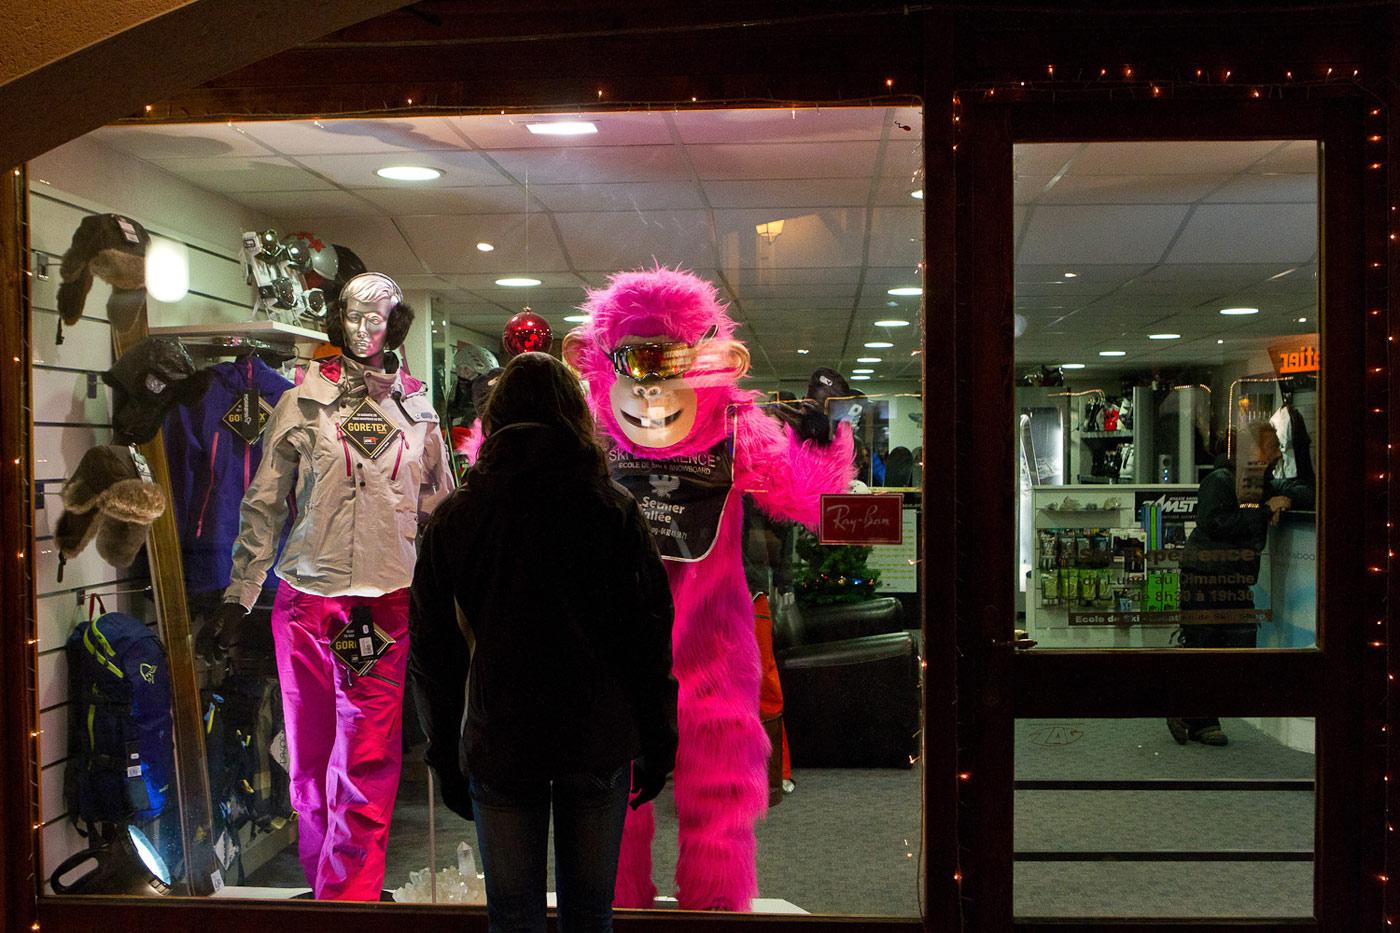 comprar material esqui snow barato Office du Tourisme Serre Chevalier